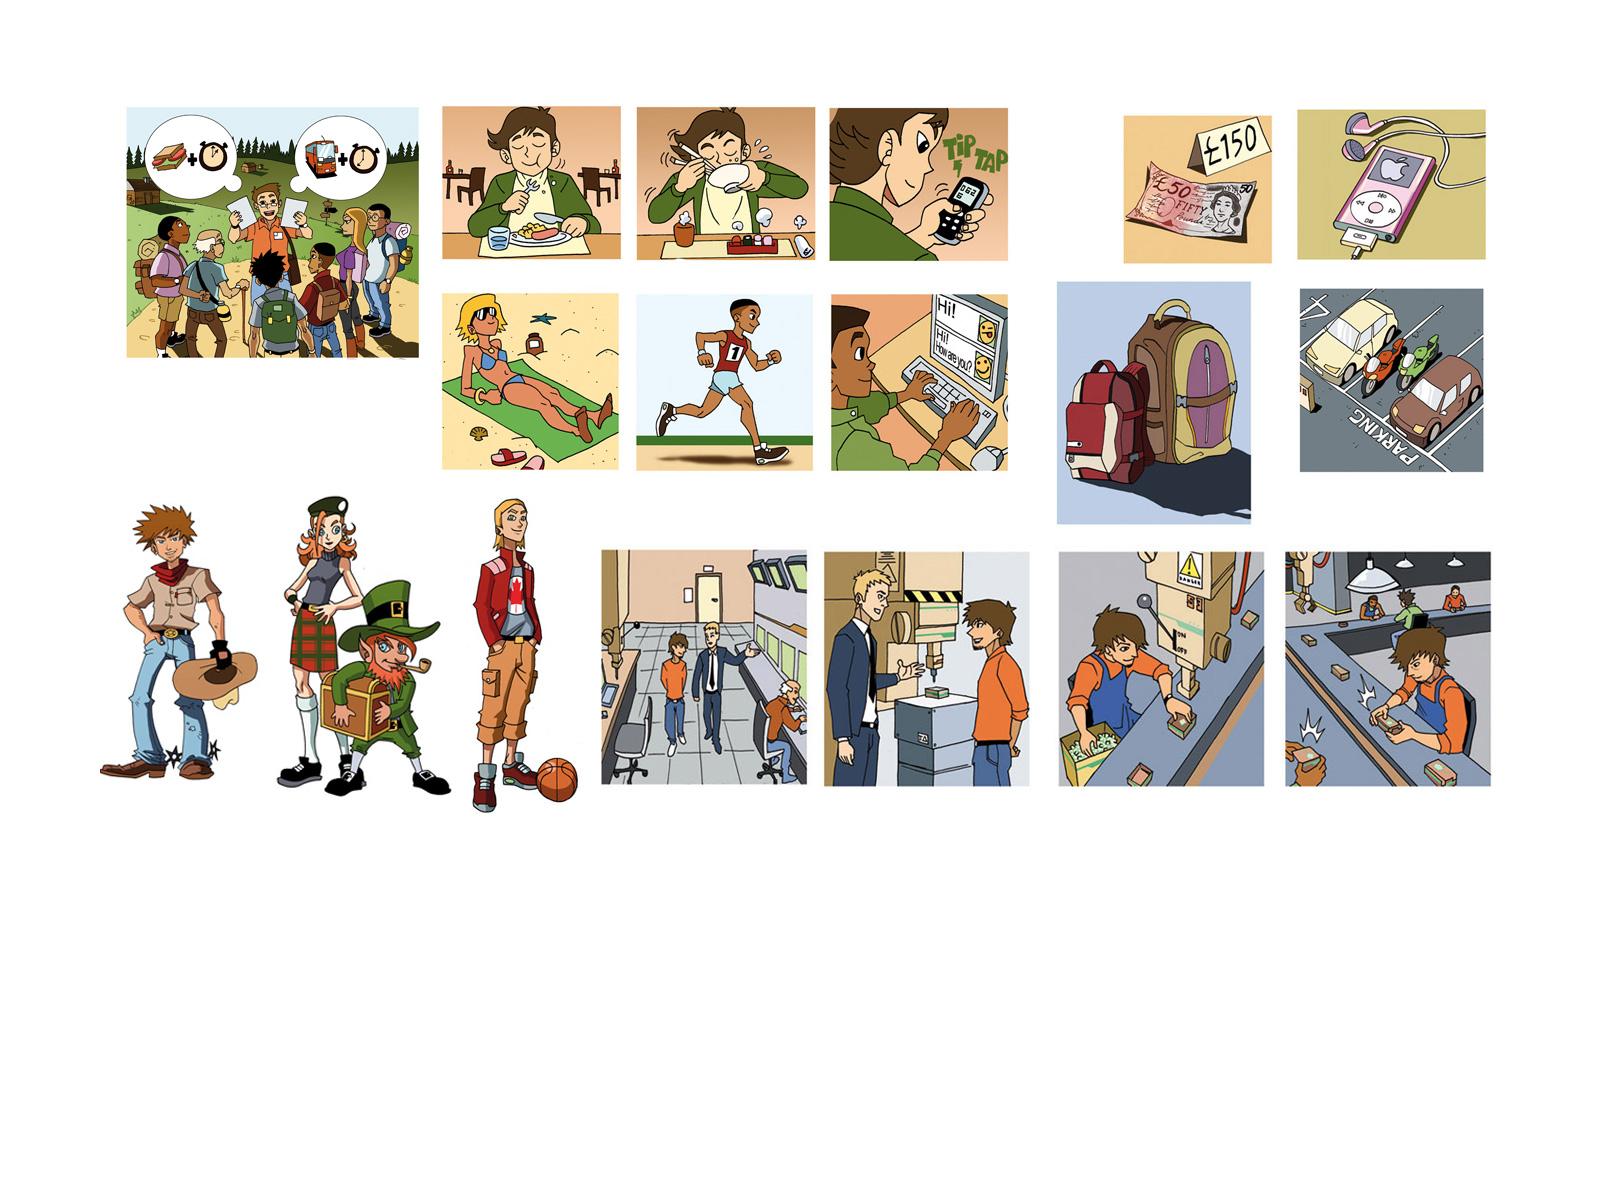 RECIOAlfonso-Illustrations-EDITIONS-2807